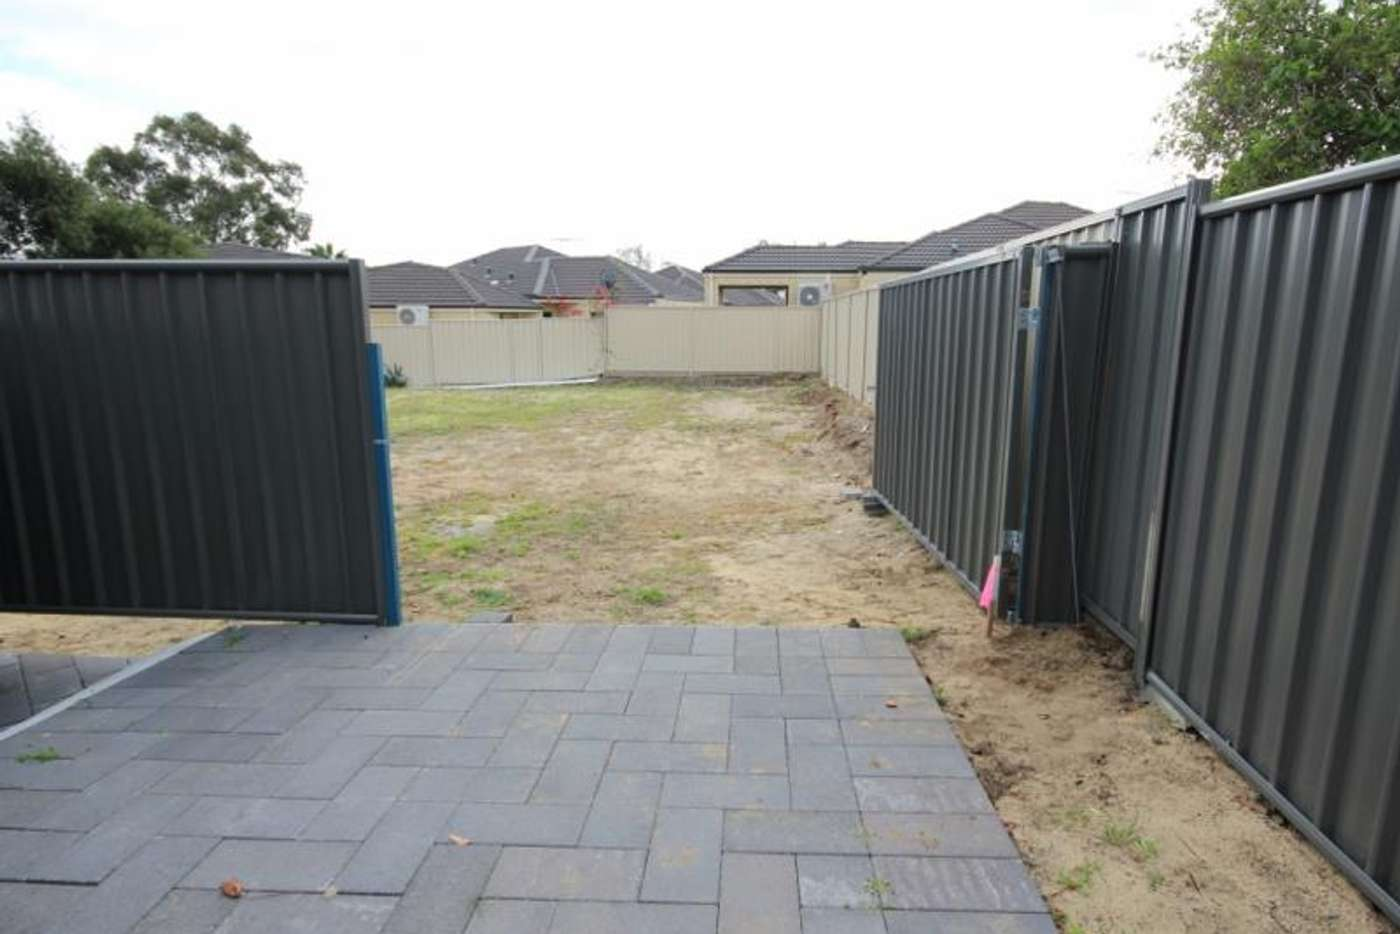 Sixth view of Homely residentialLand listing, 21B Tangmere Way, Balga WA 6061